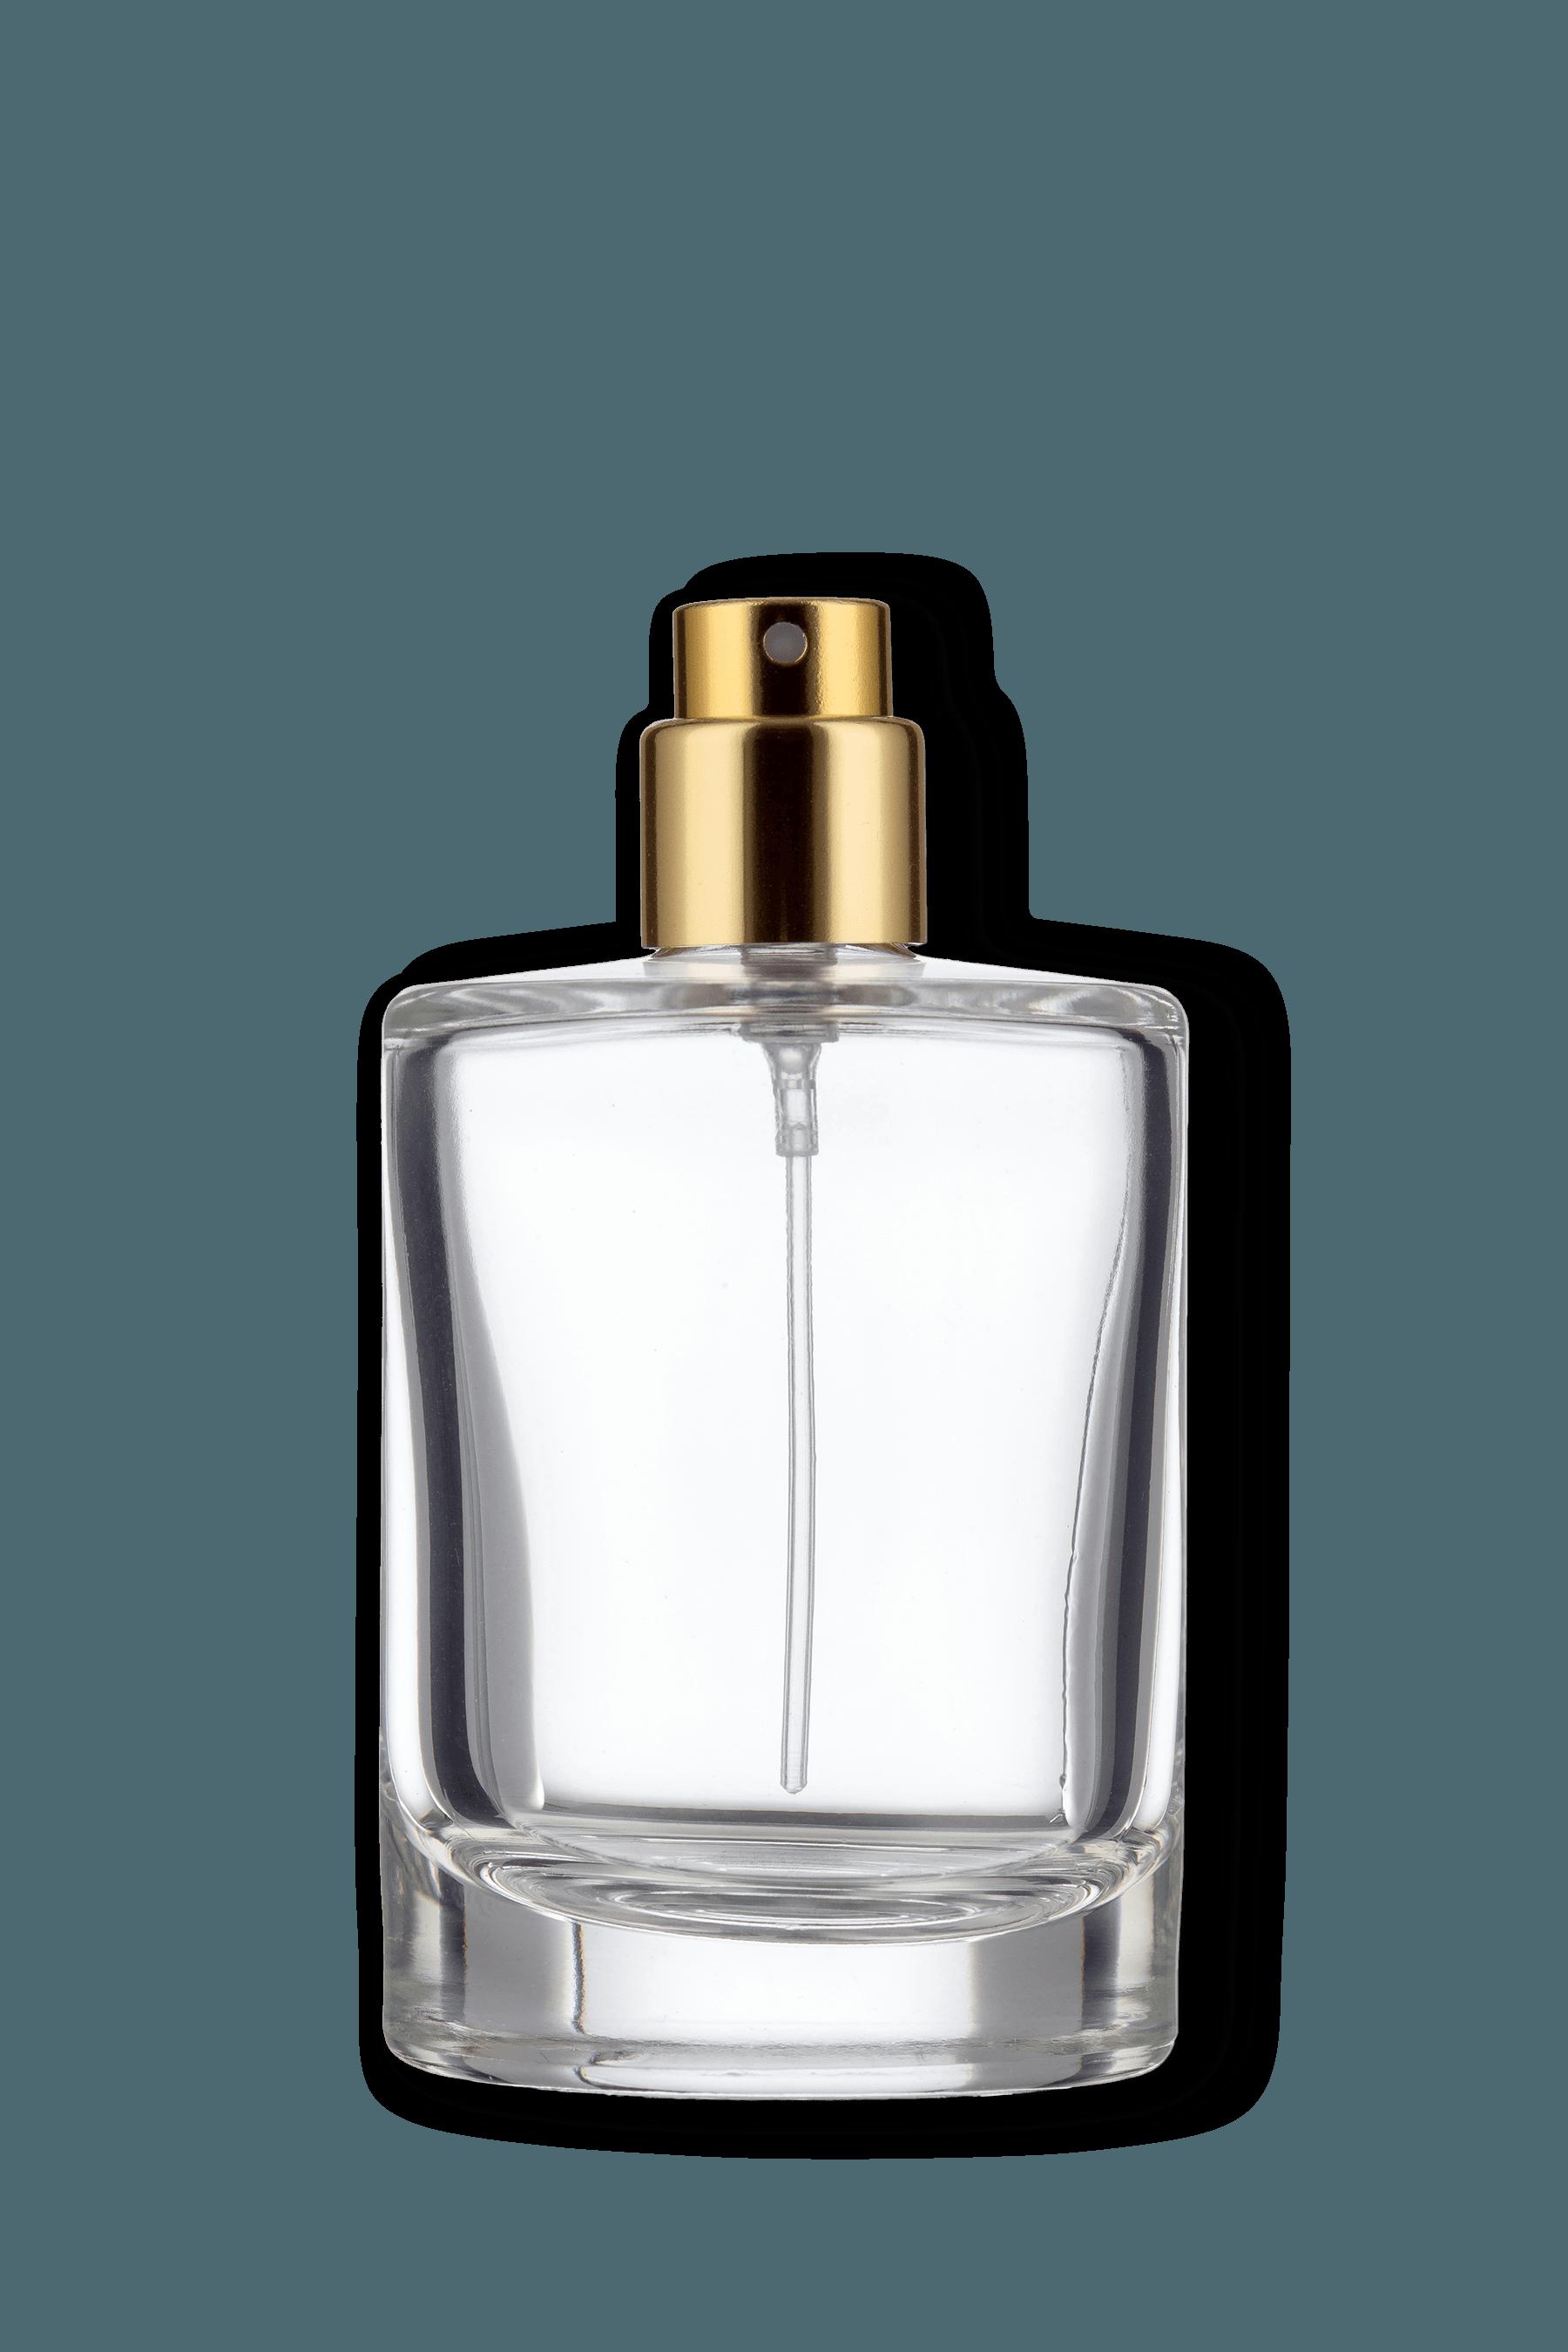 everytime i see a perfume bottle i